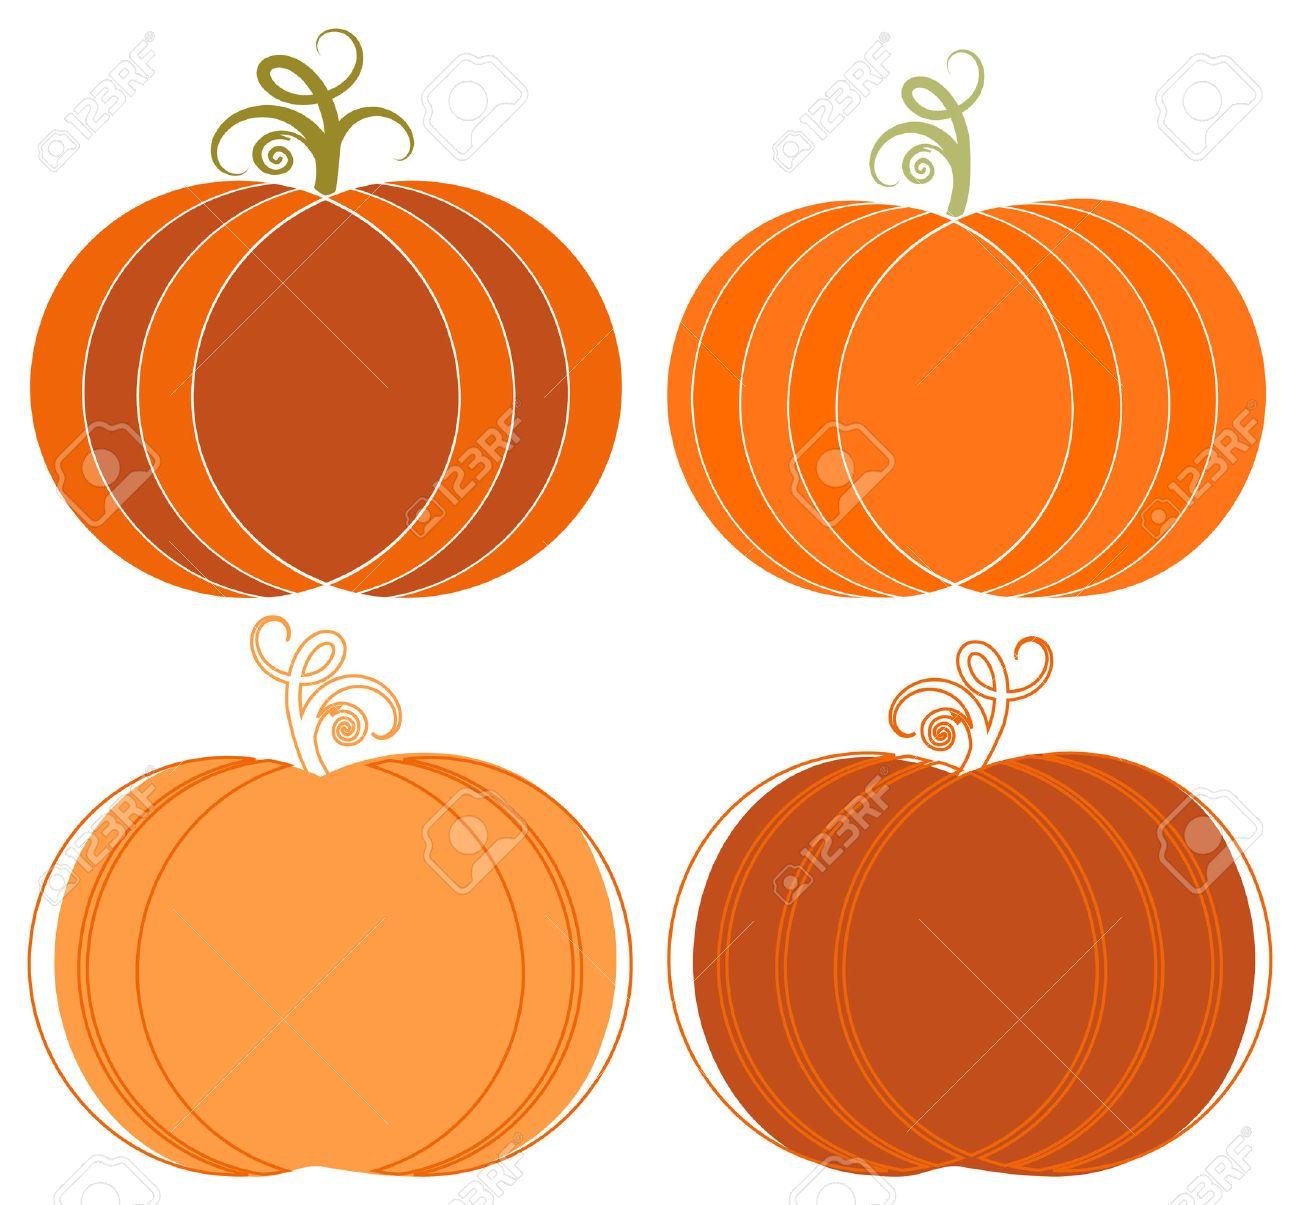 whimsical halloween pumpkins clip art set royalty free cliparts